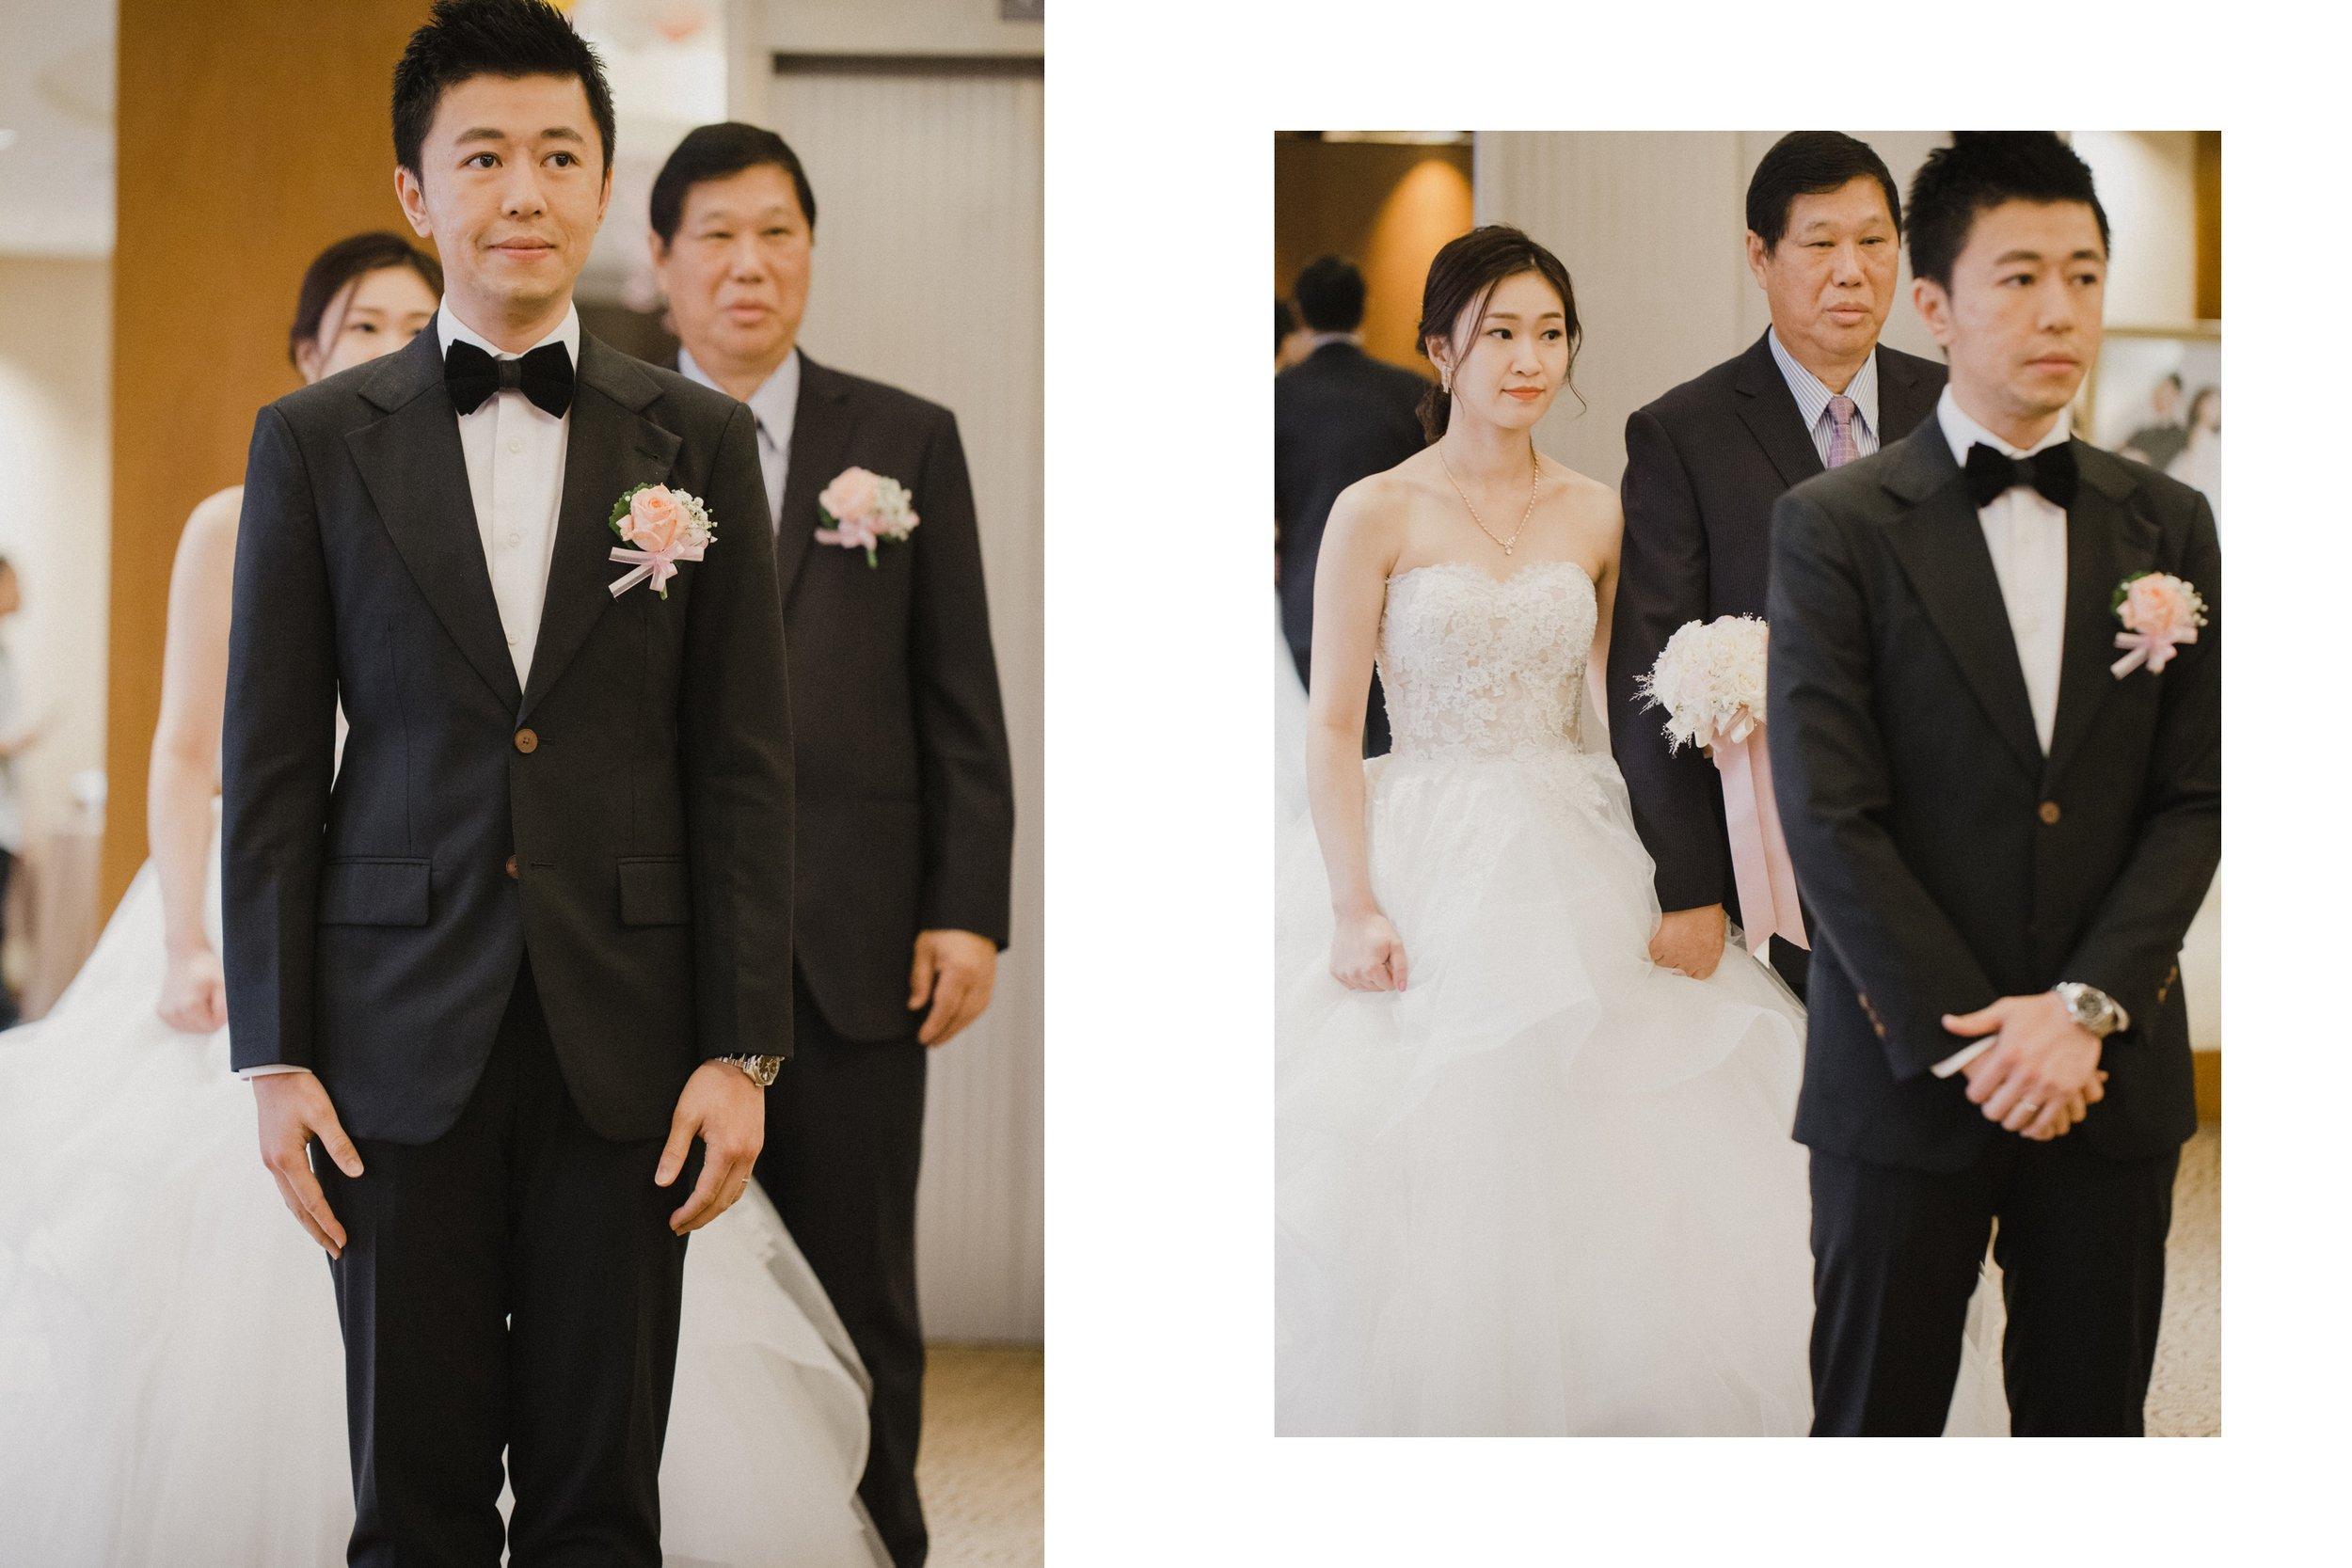 wedding-caridee-oscar-lunch-ambassador-hsinchu-結婚午宴-新竹國賓_54.jpg